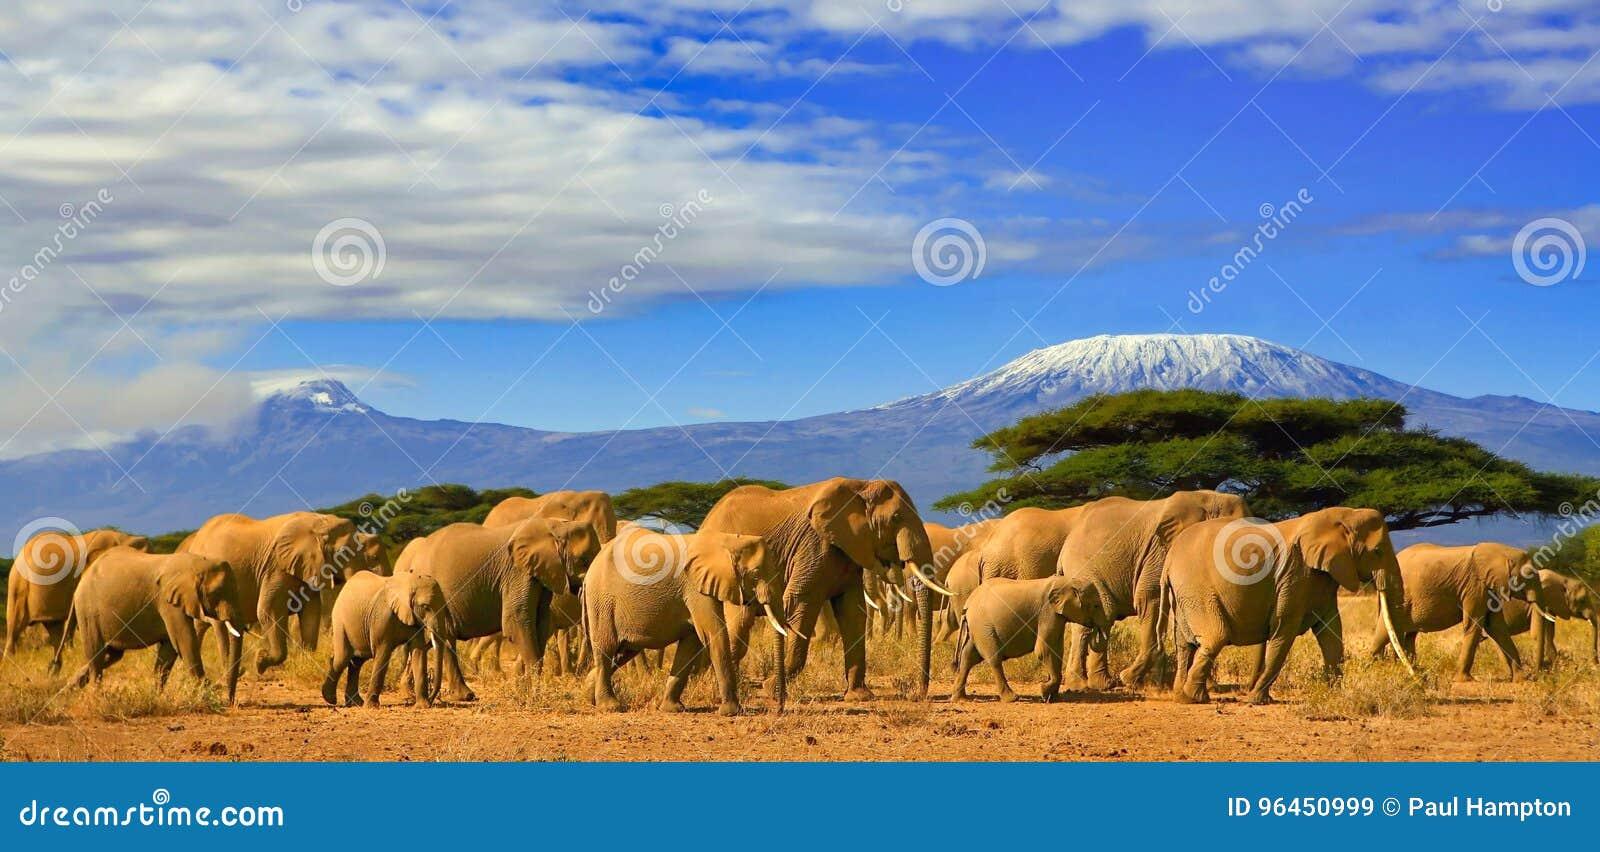 Kilimanjaro Tanzania Afrykańskich słoni safari Kenja